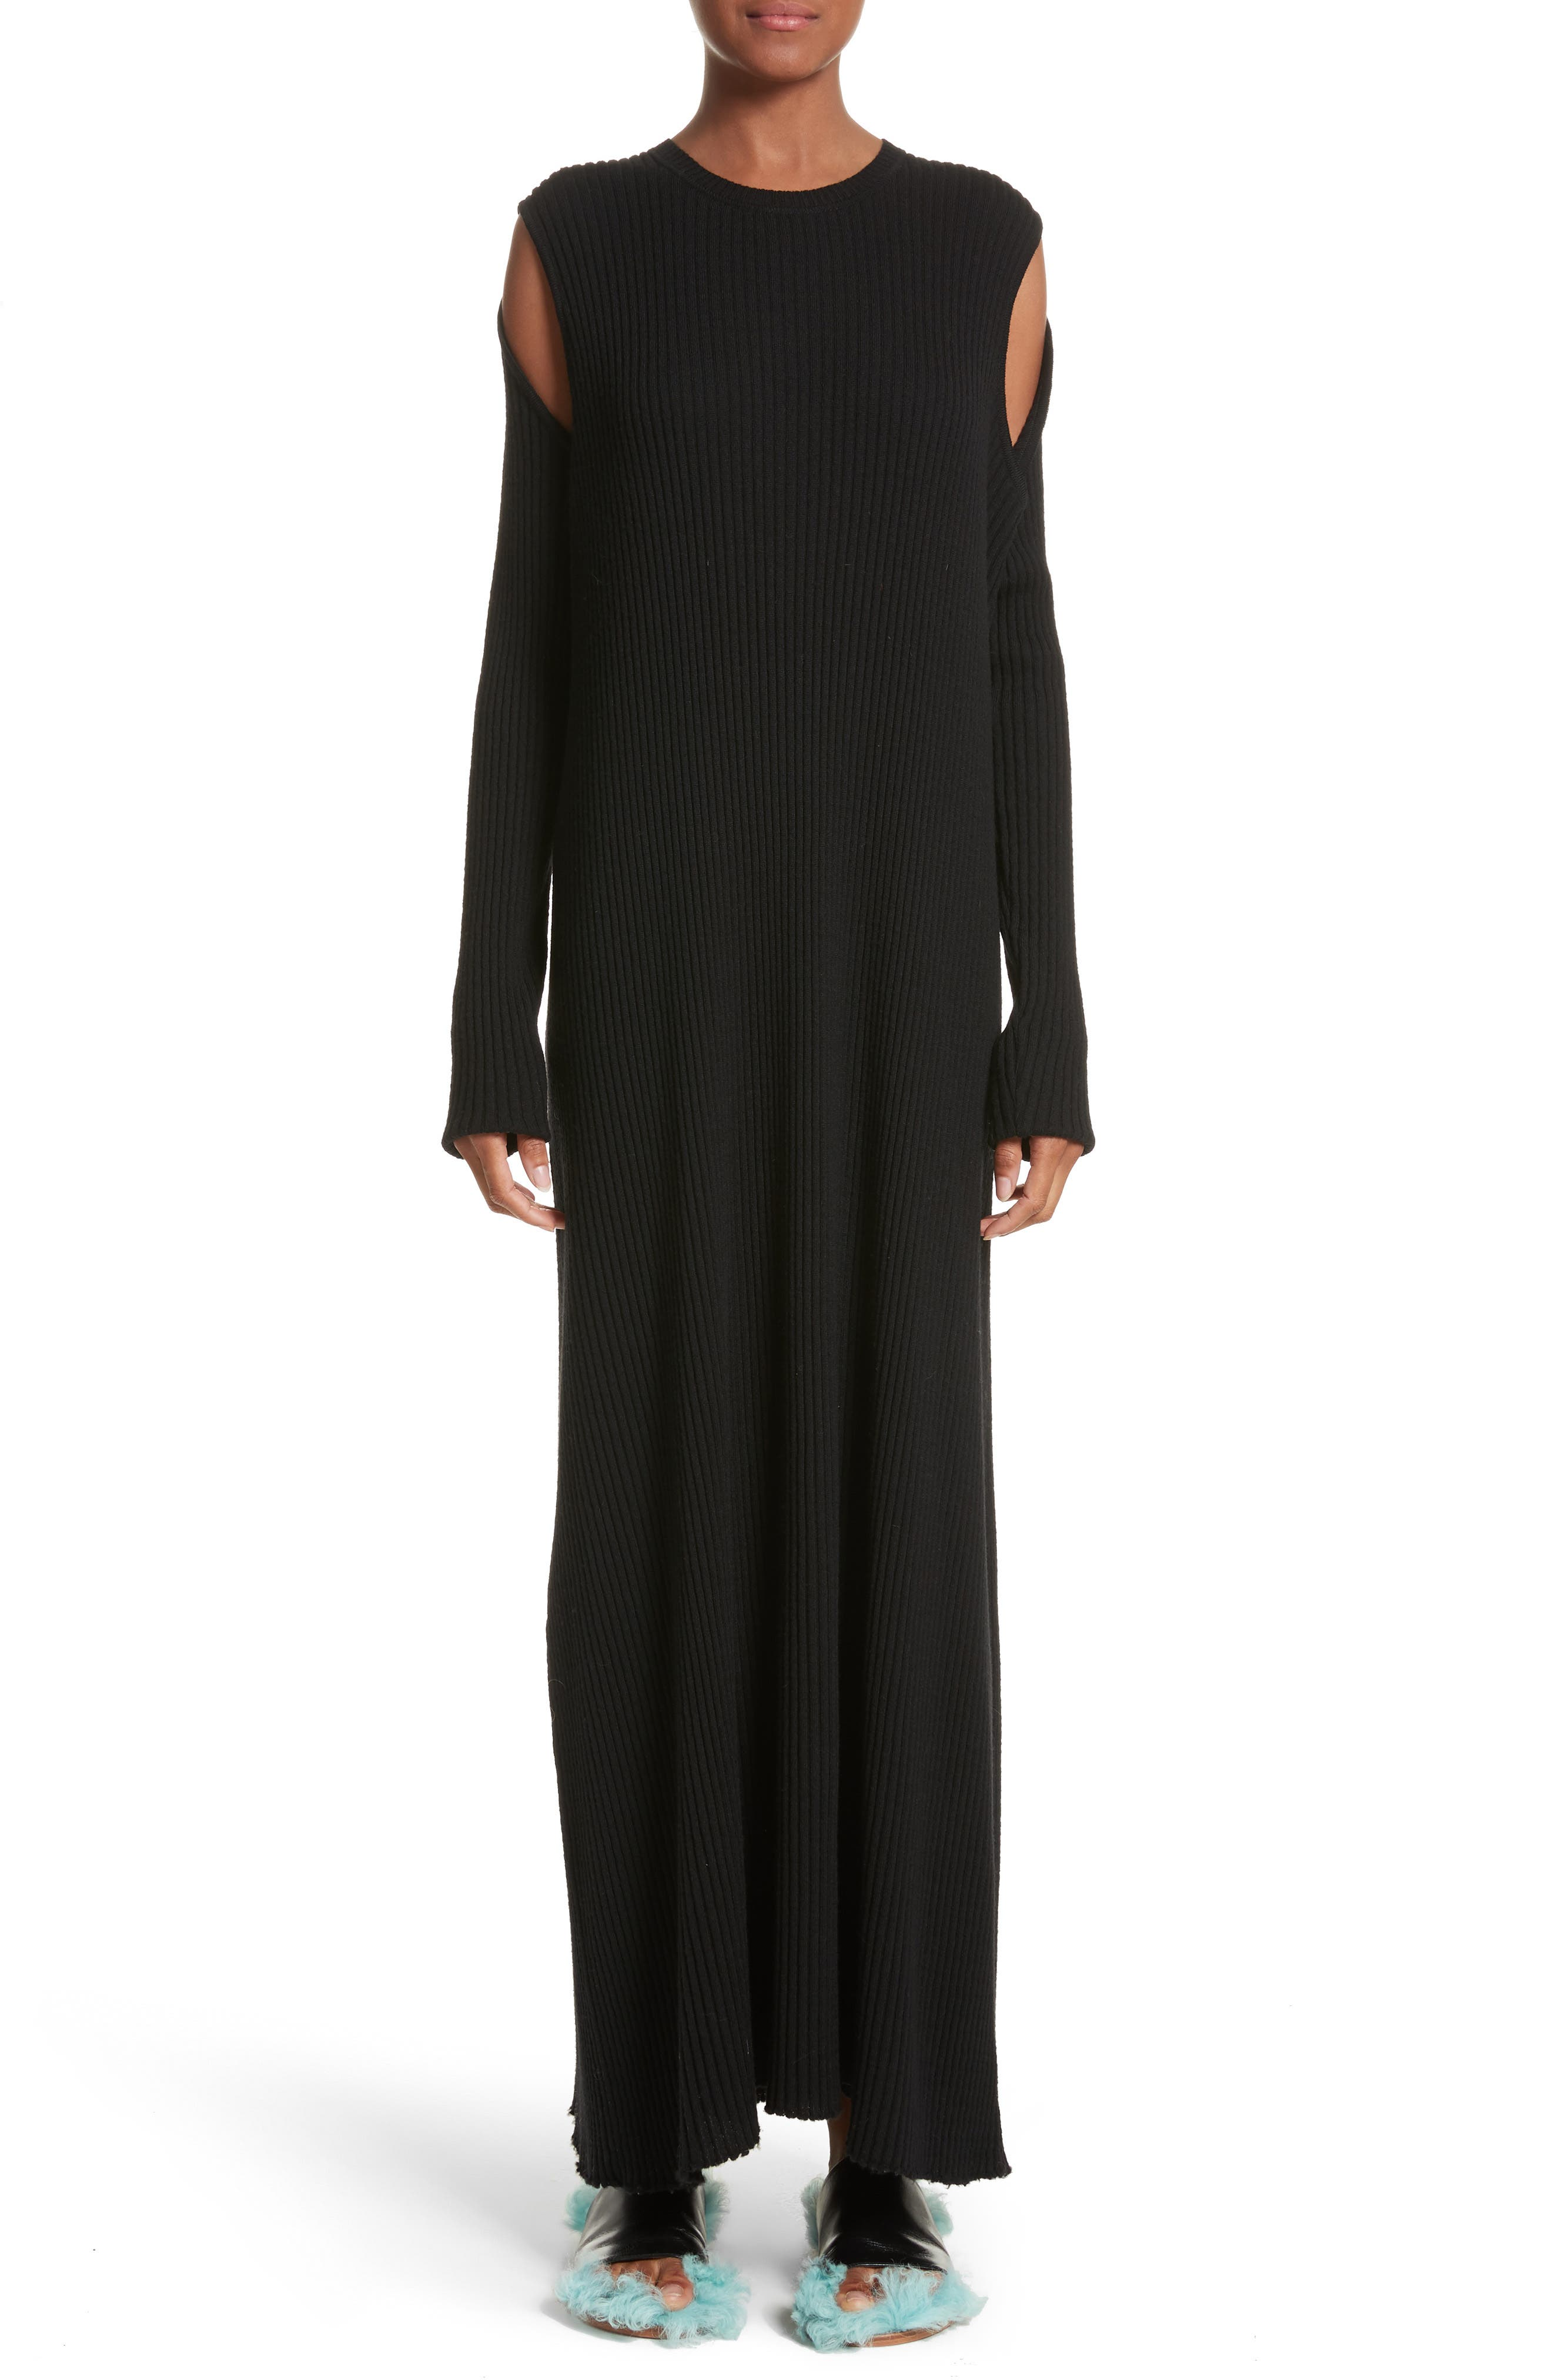 Main Image - Marques'Almeida Ribbed Cold Shoulder Maxi Dress